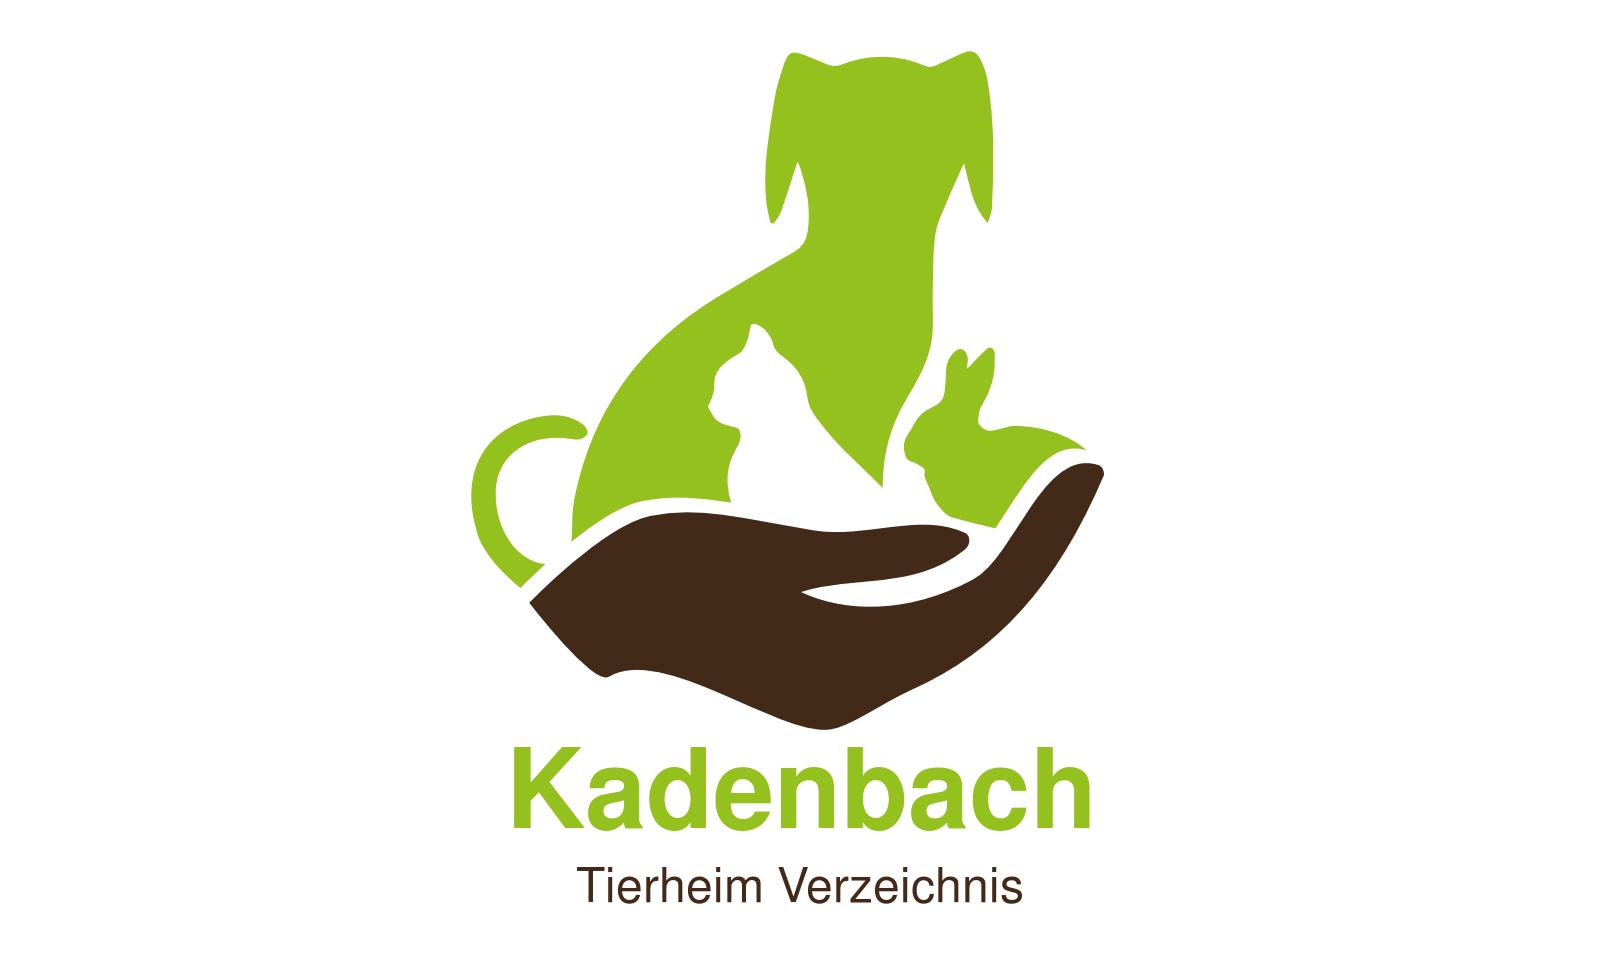 Tierheim Kadenbach